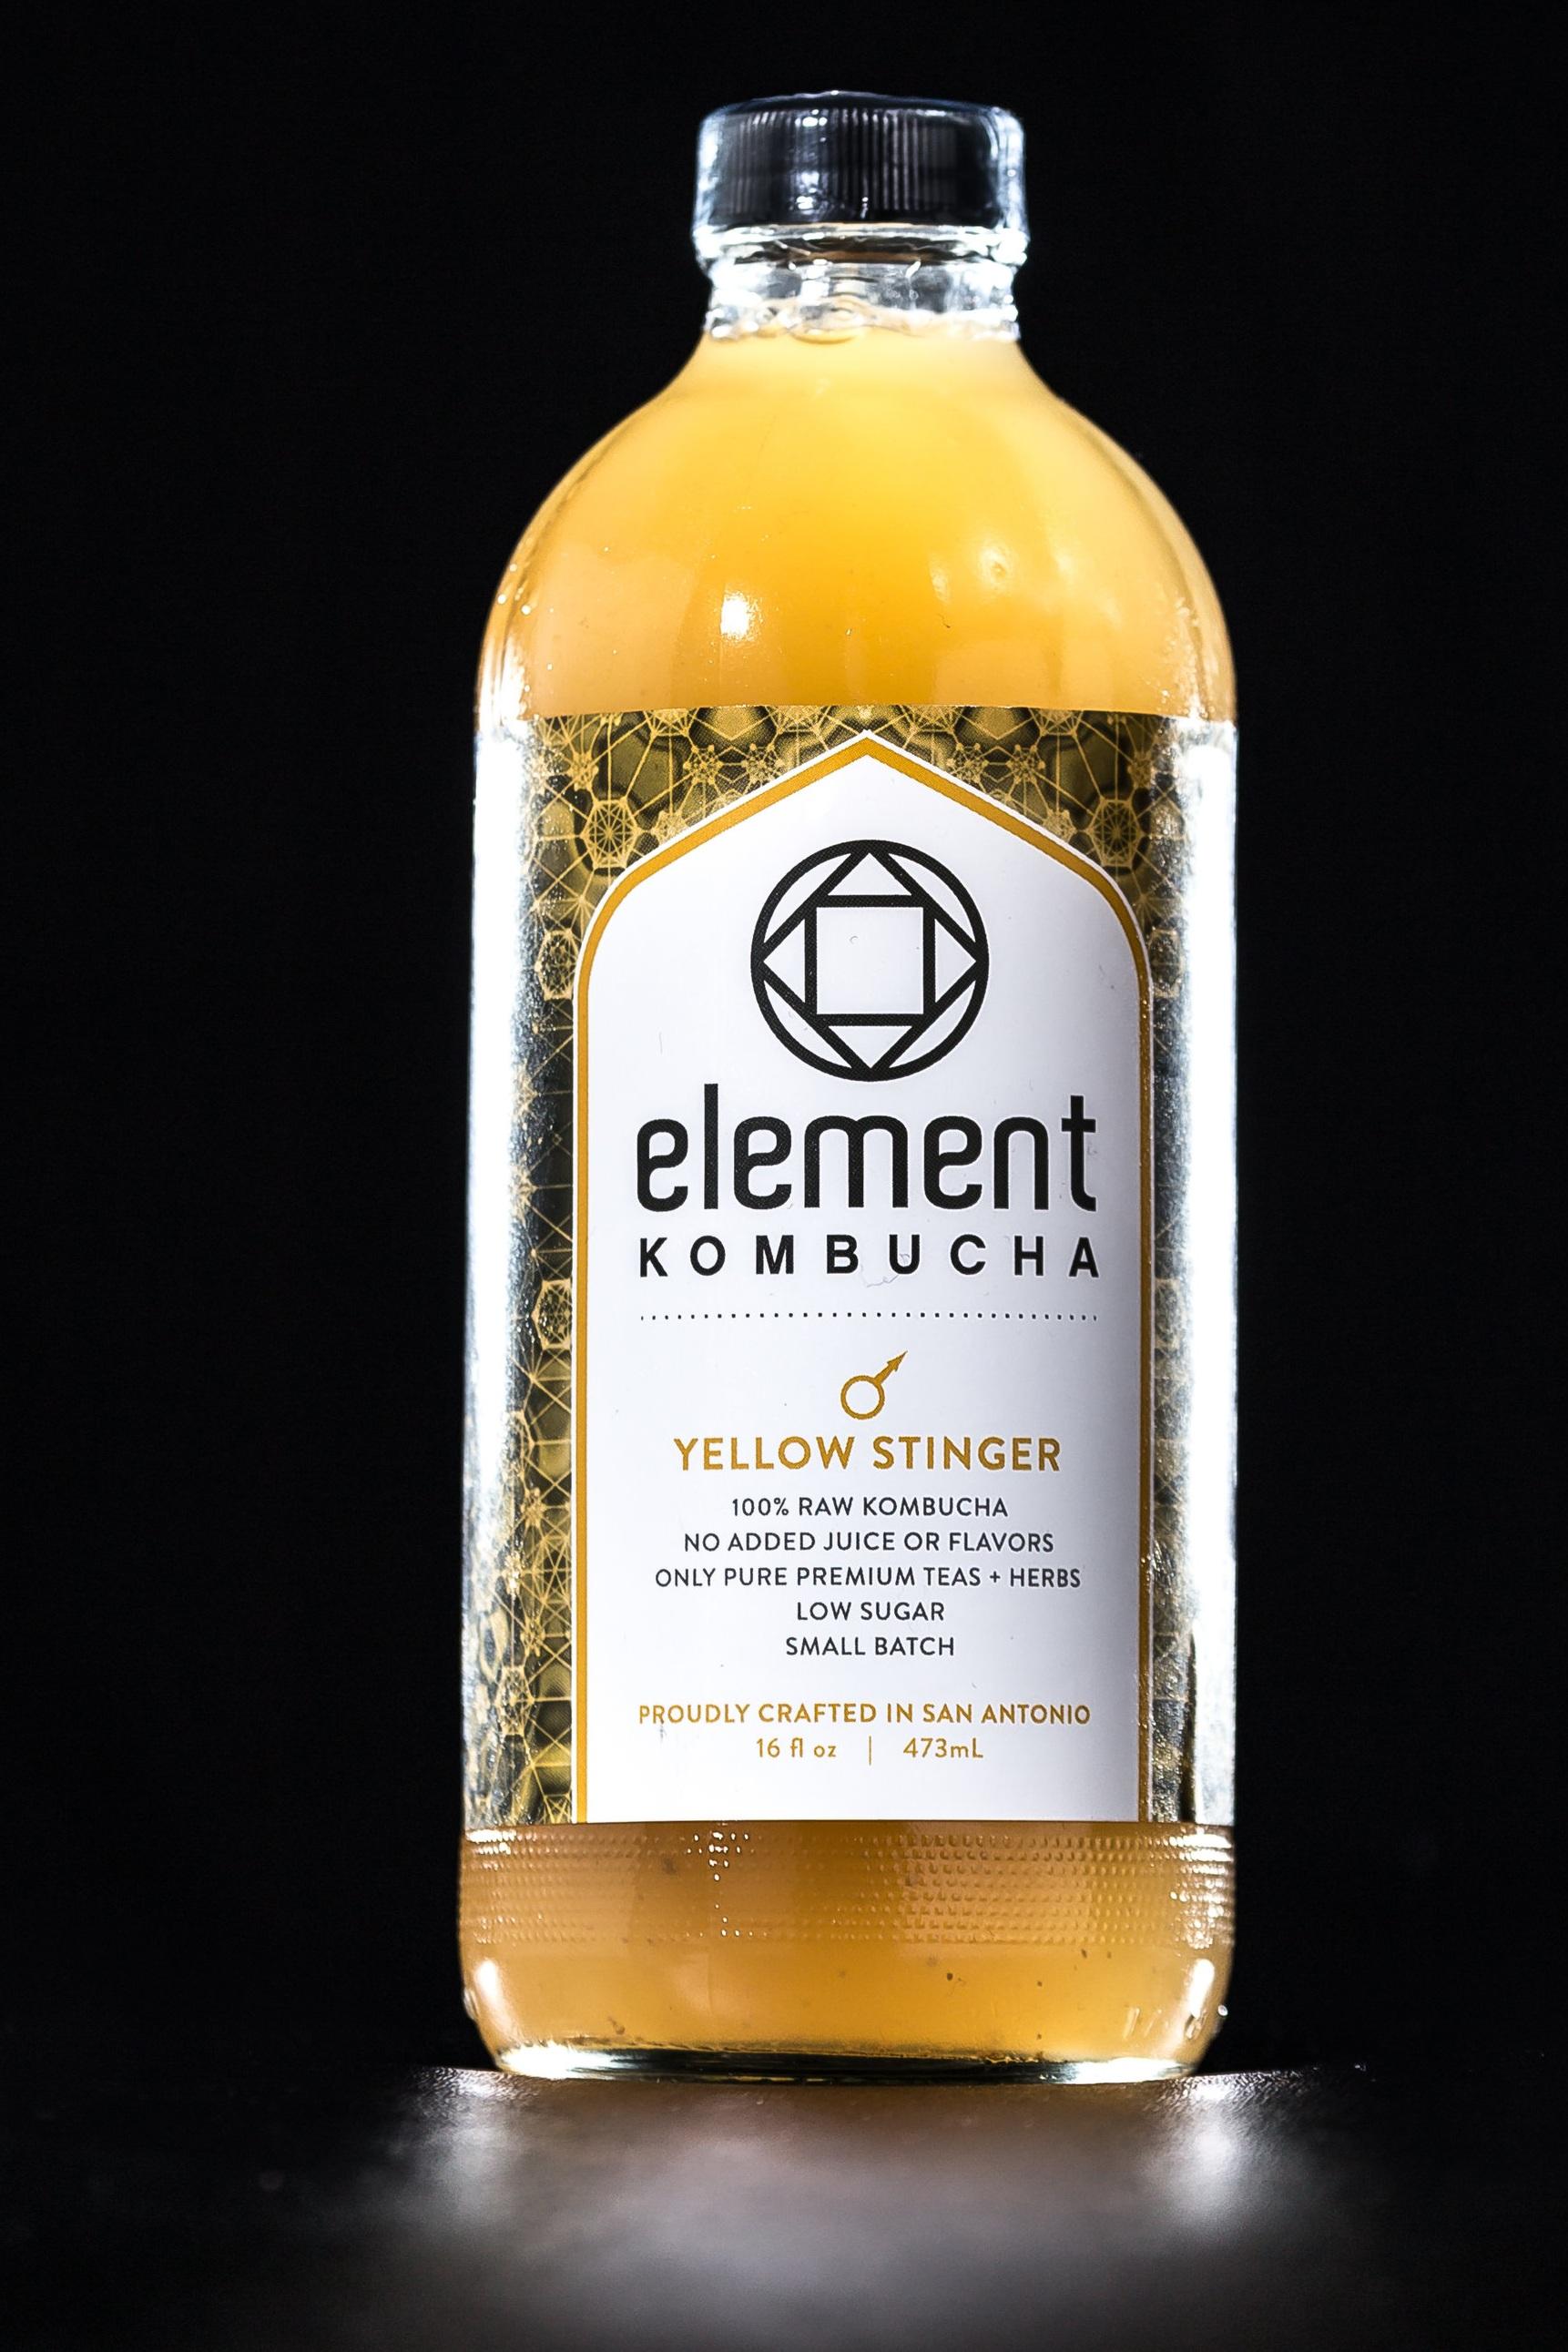 Element Kombucha Yellow Stinger